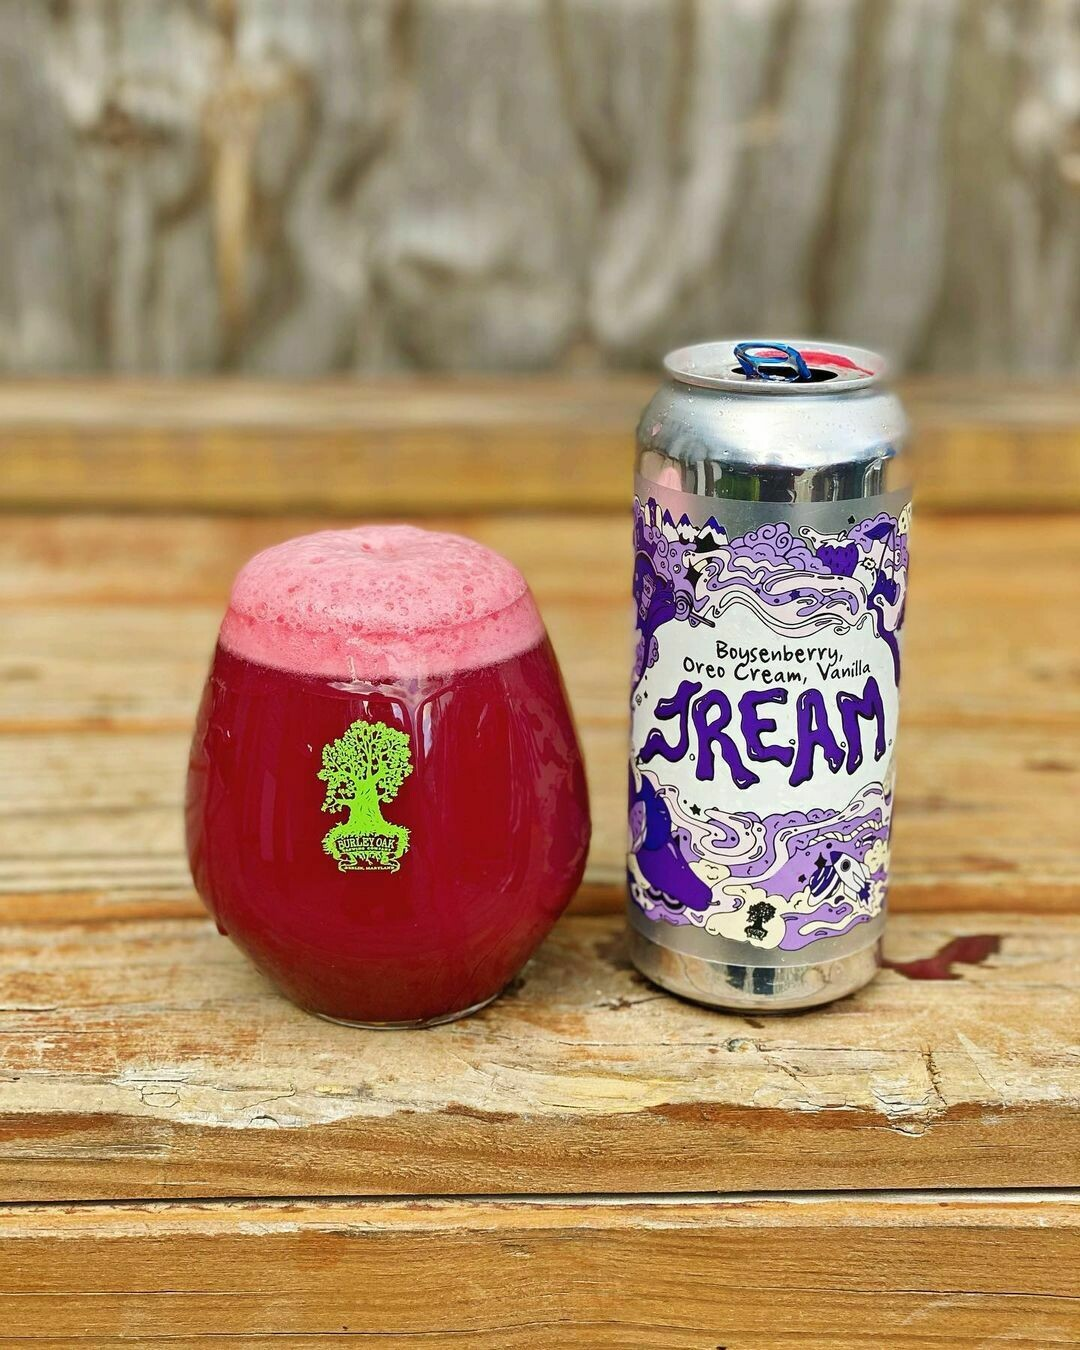 Burley Oak Brewing Company Boysenberry Oreo Cream Vanilla JREAM Sour Ale (4-PACK)